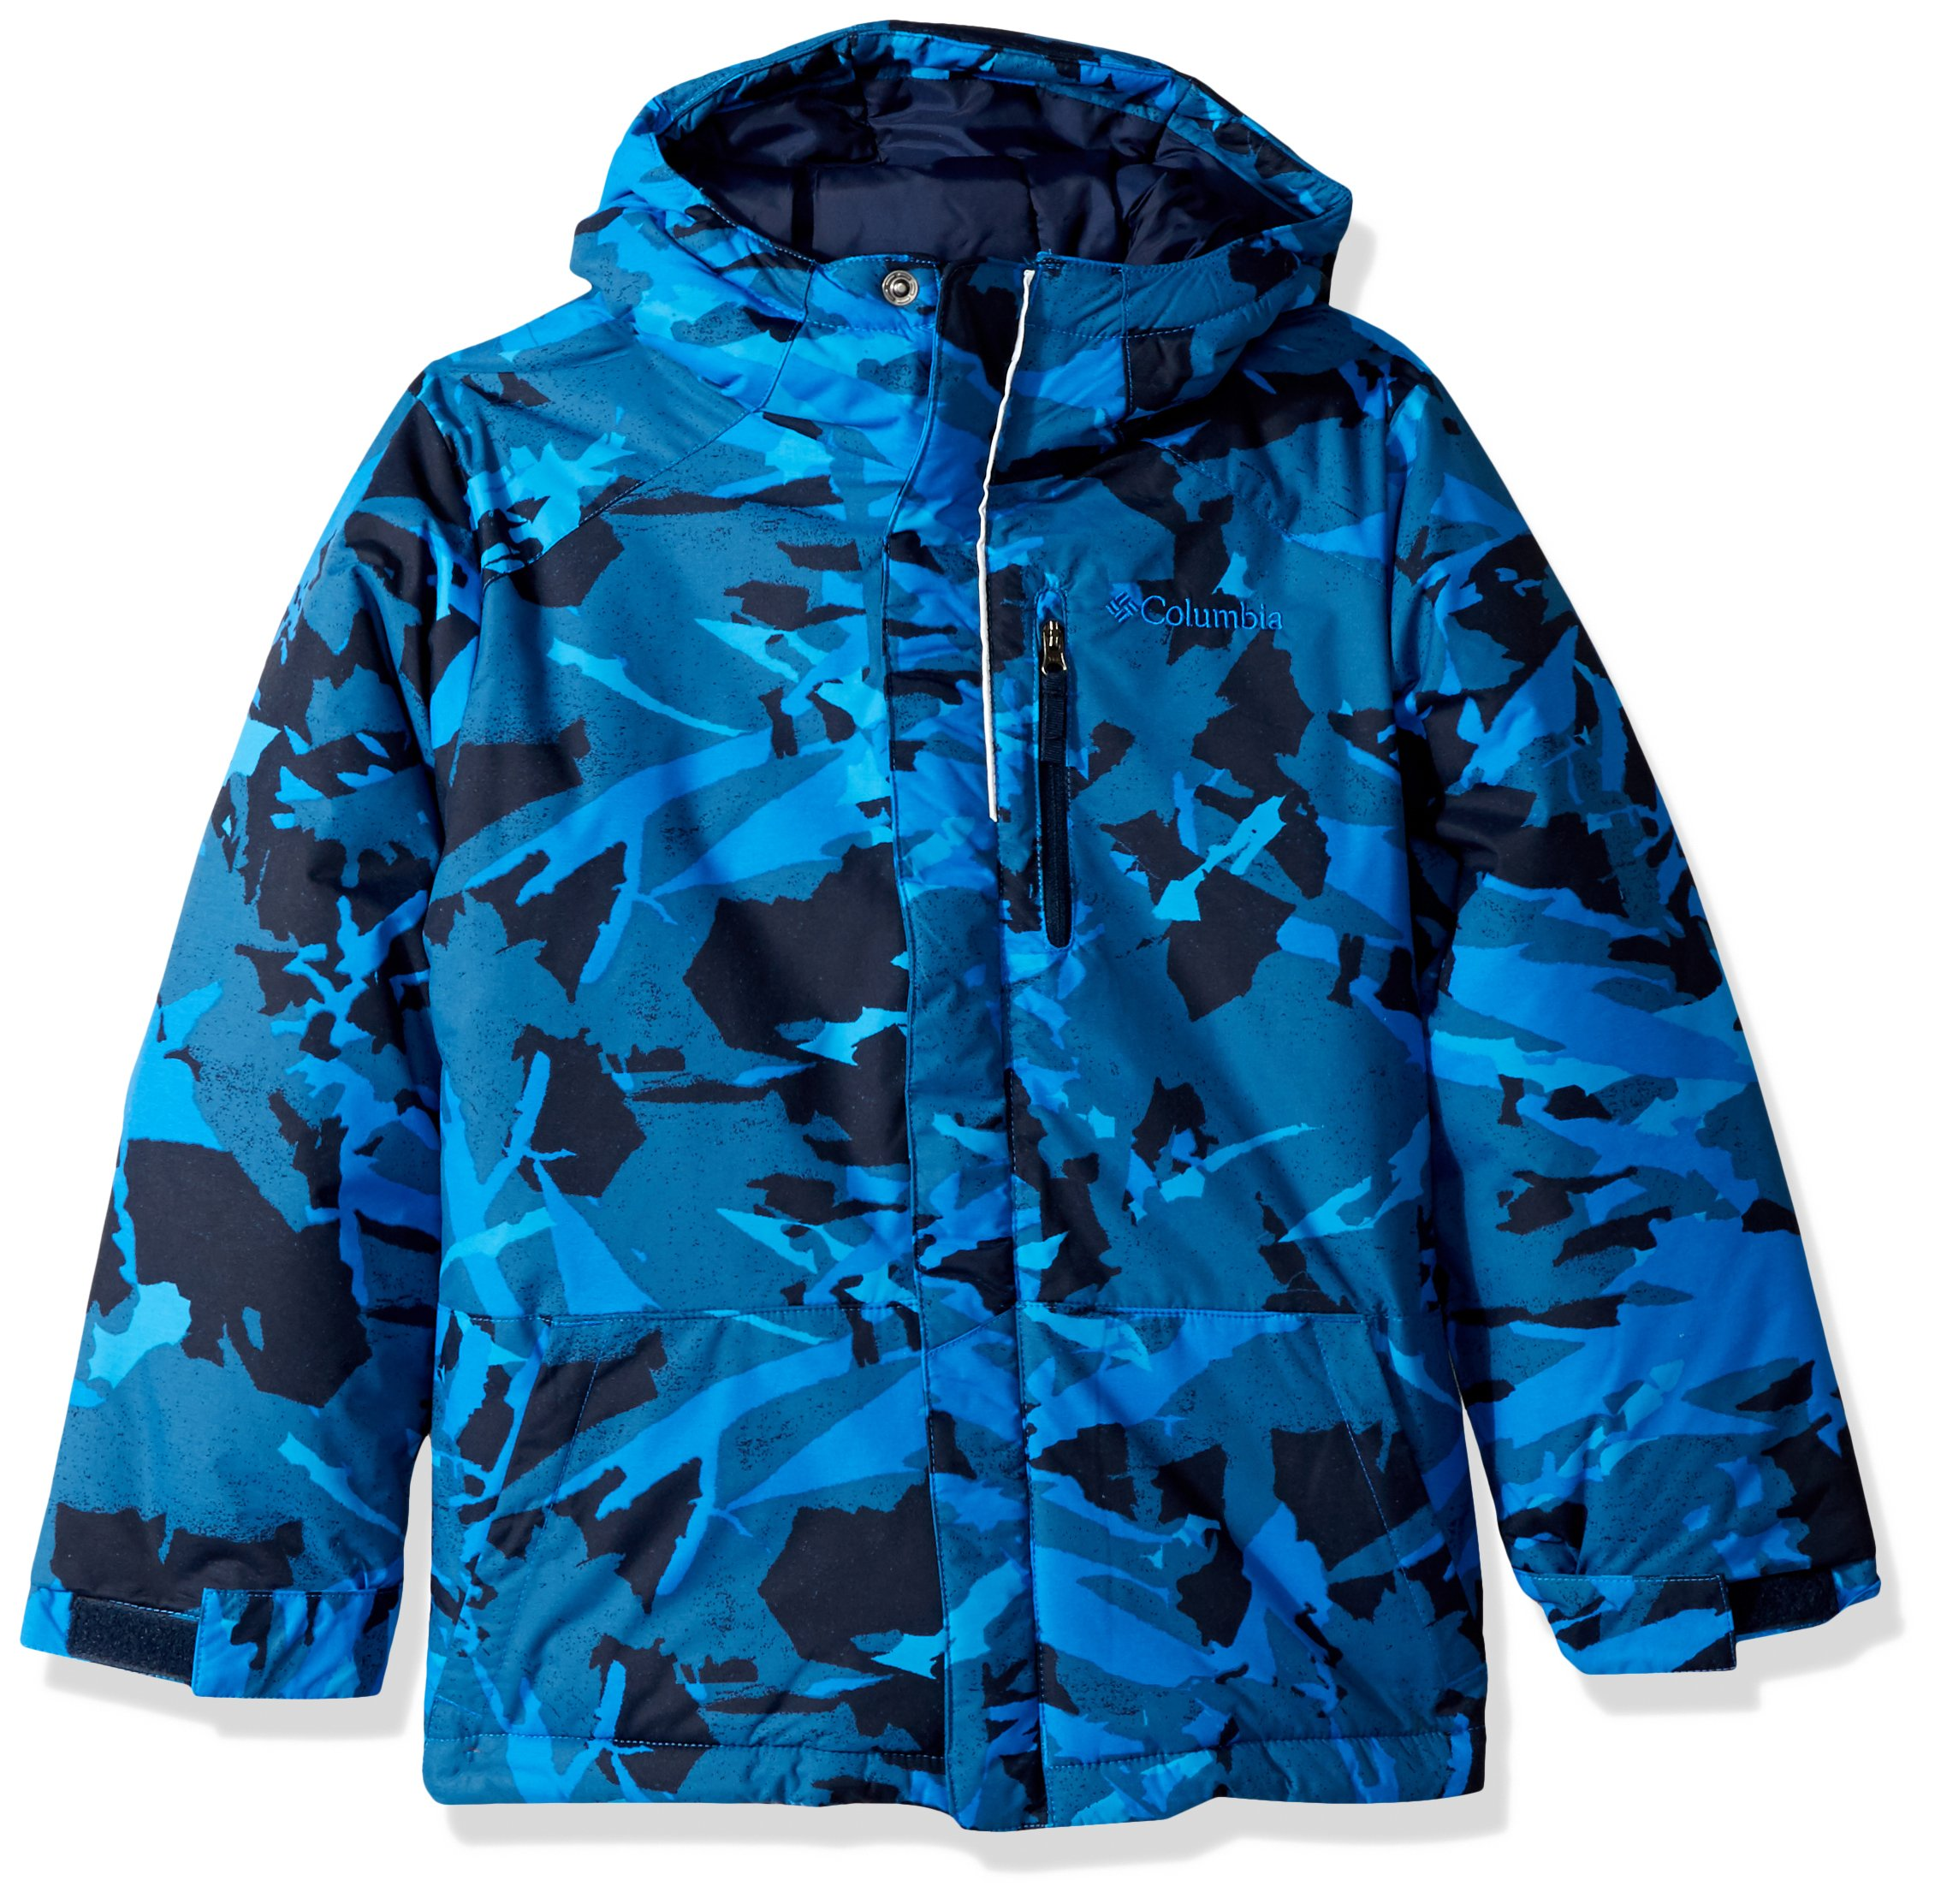 Columbia Boys' Toddler' Lightning Lift Jacket, Super Blue Woodsy Camo, 2T